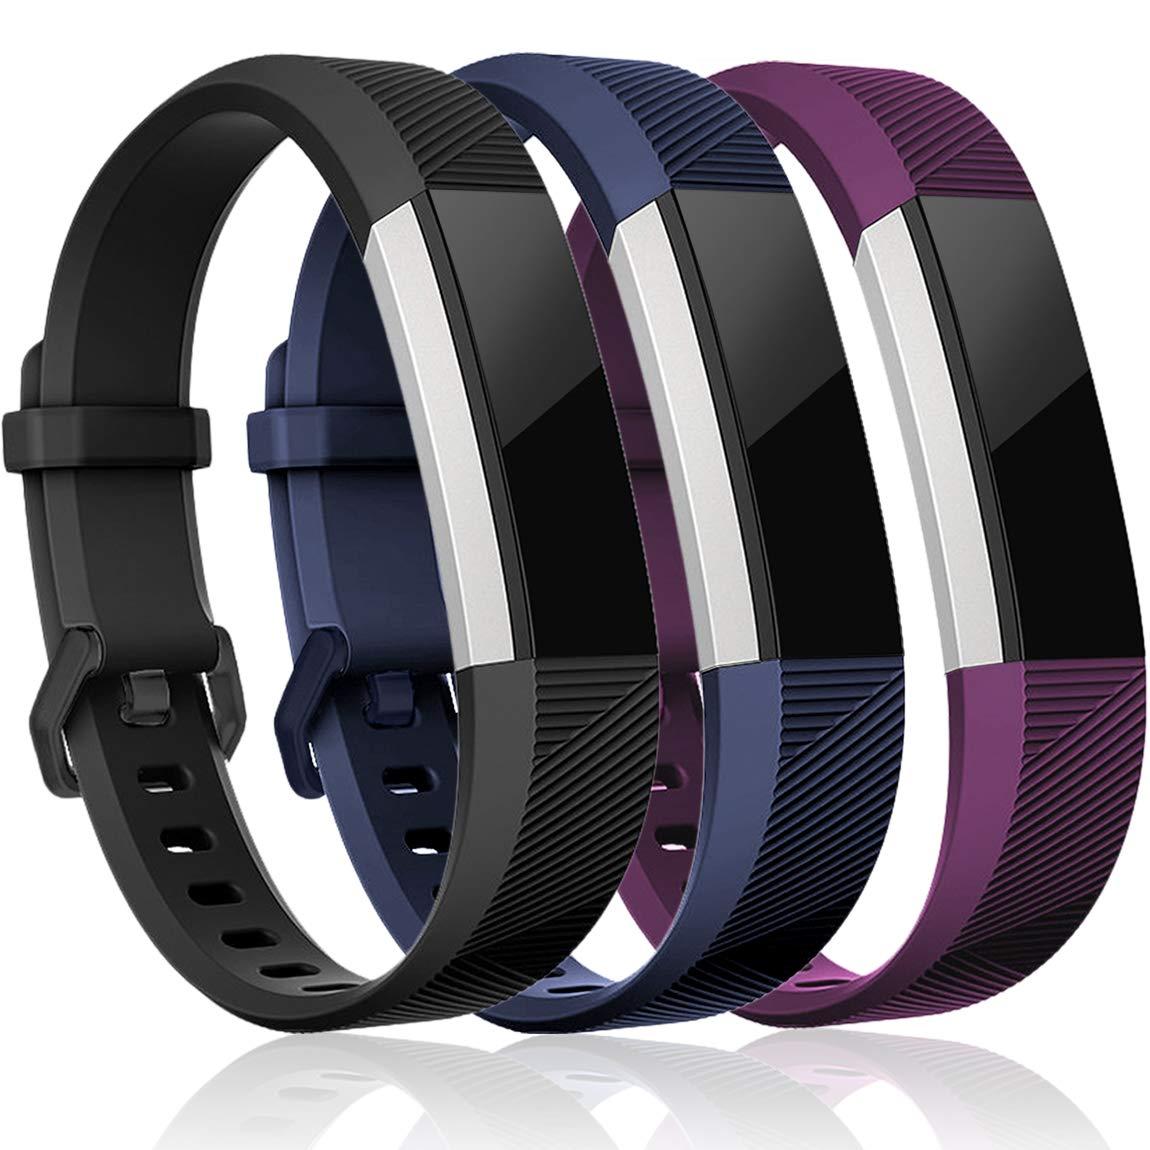 Mallas Reloj Fitbit Alta, Alta Hr, Fitbit Ace (3 Unid (KNZ6)